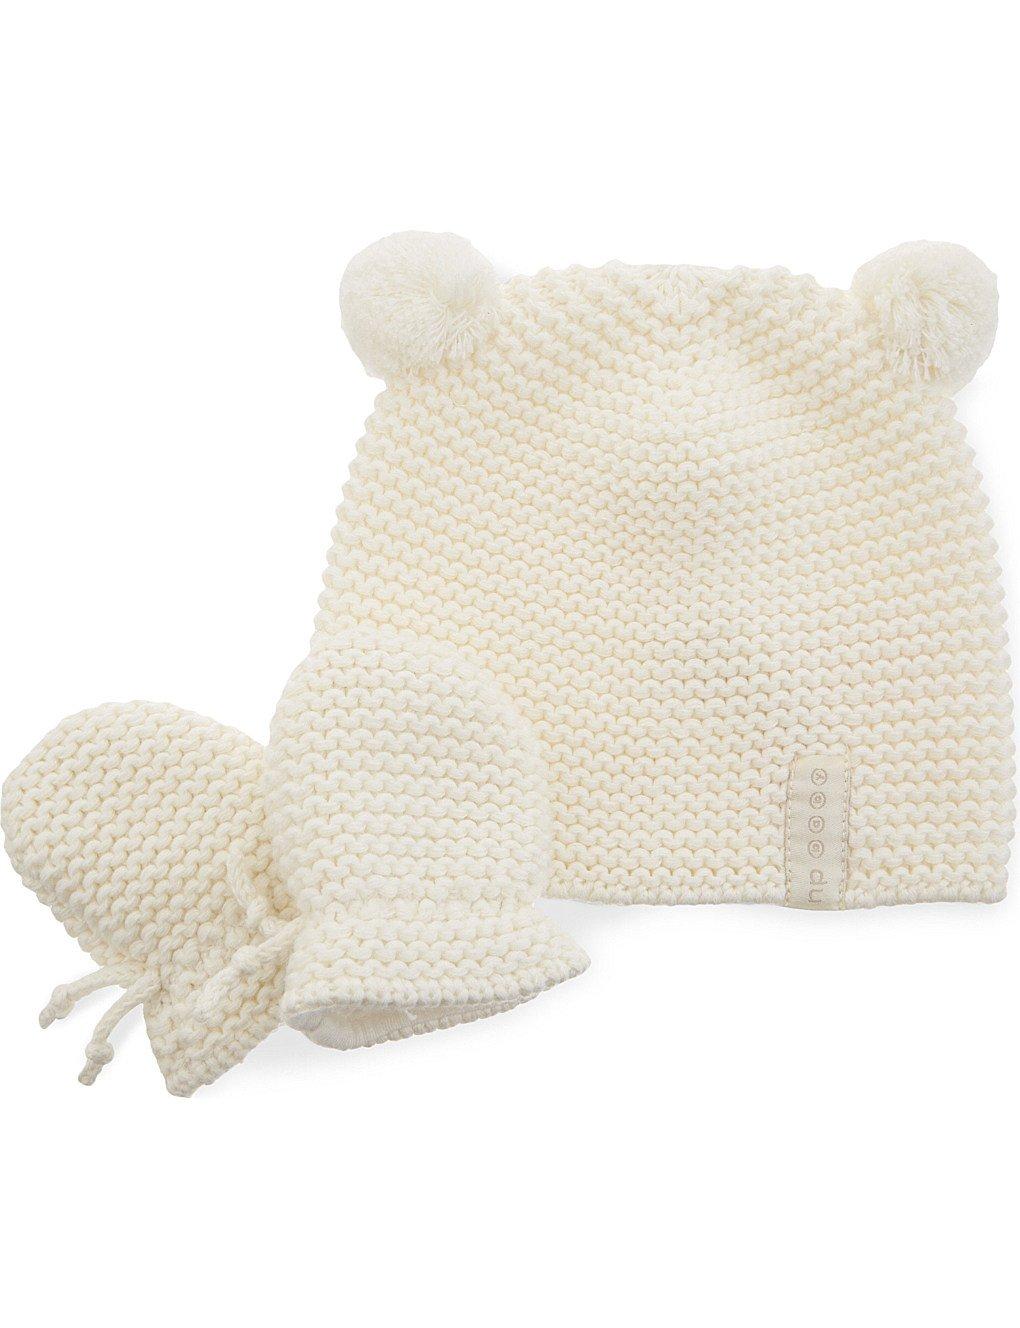 Natures Purest Pom Pom Organic Cotton Hat & Mittens Set 0-6 Months